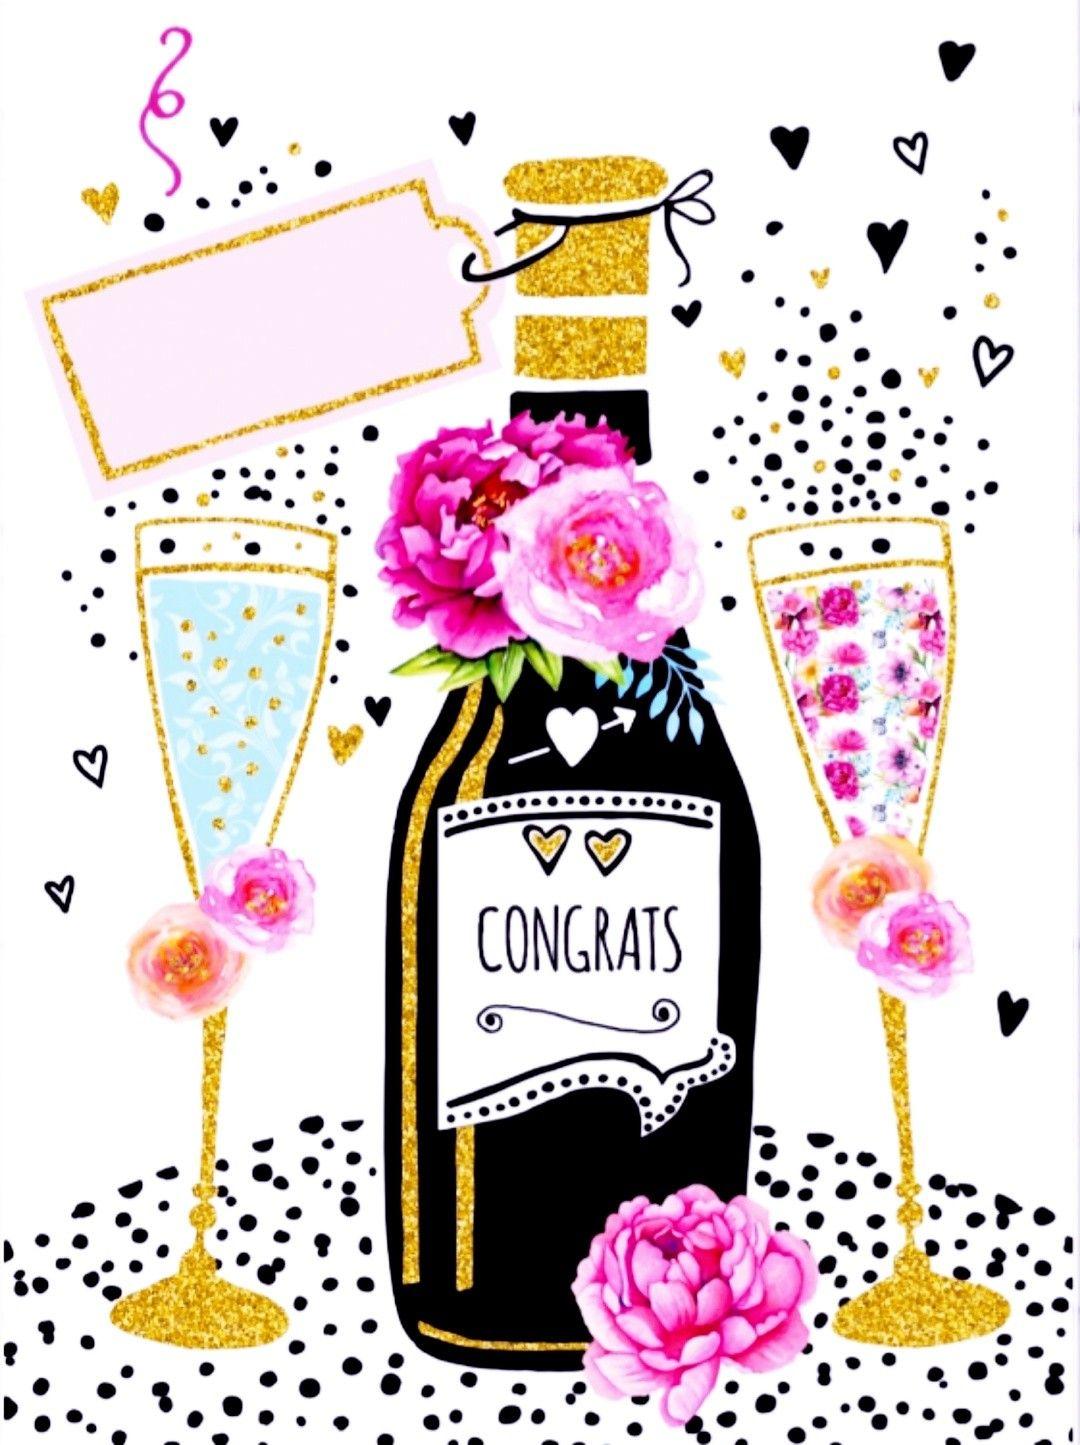 Congrats! Happy birthday wine, Happy birthday greetings